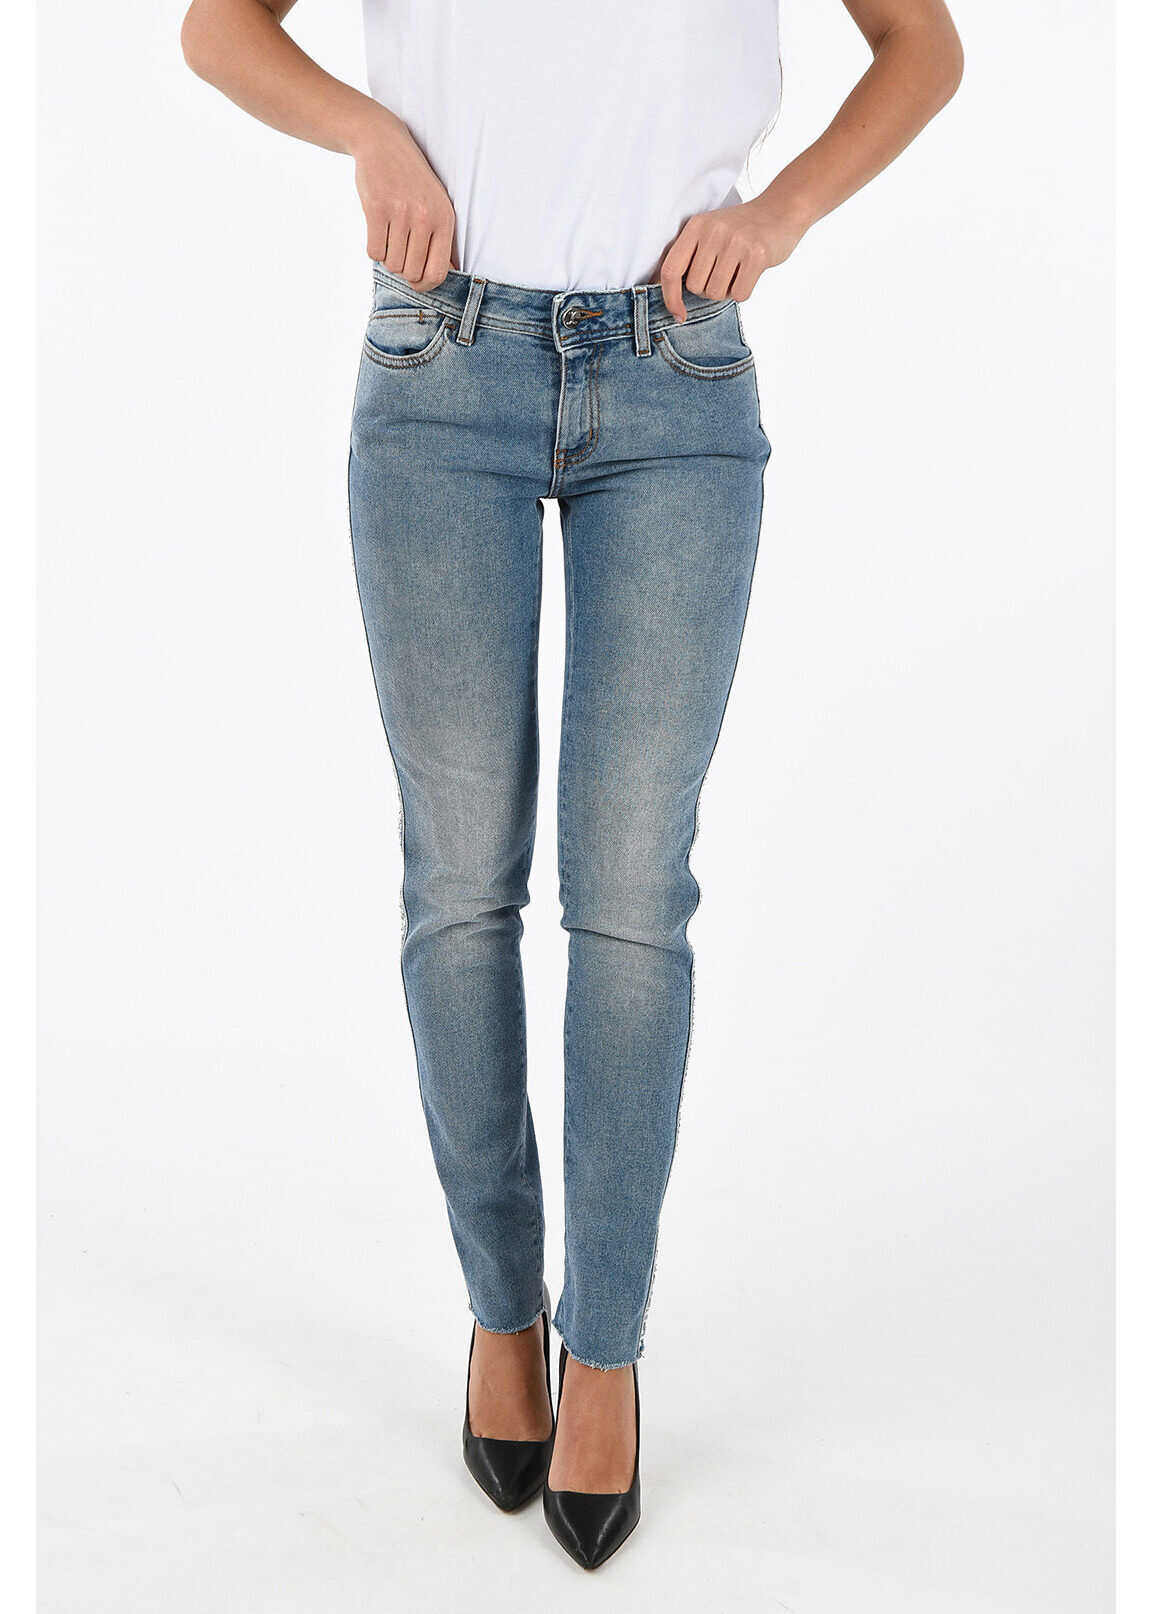 Just Cavalli Studded Slim Fit Jeans BLUE